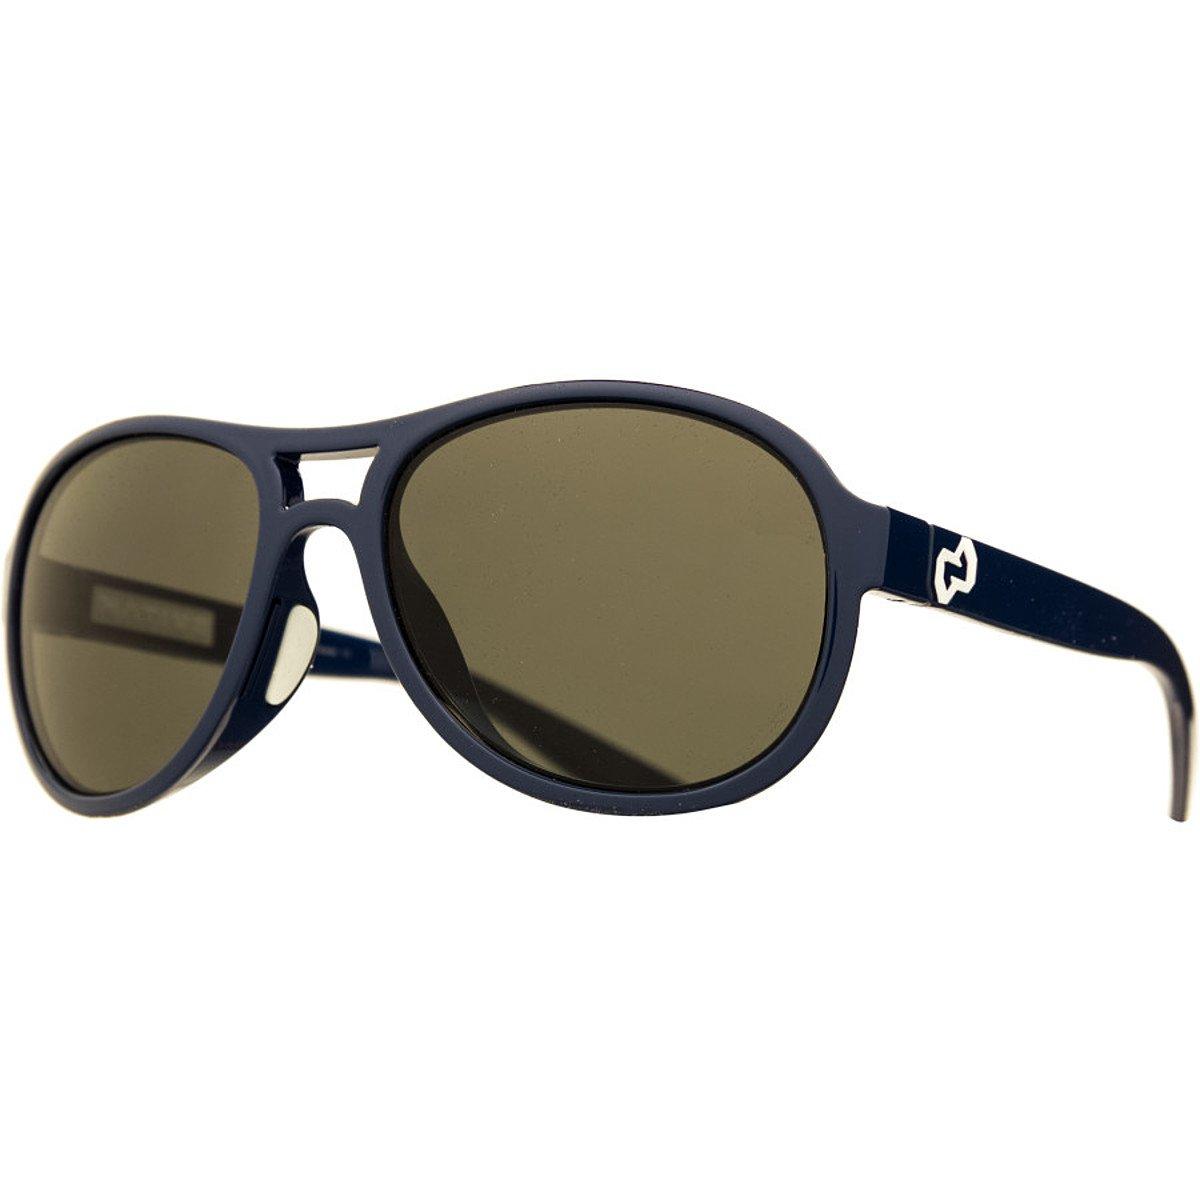 9092329239 Native Eyewear Chilkat Polarized Sunglass